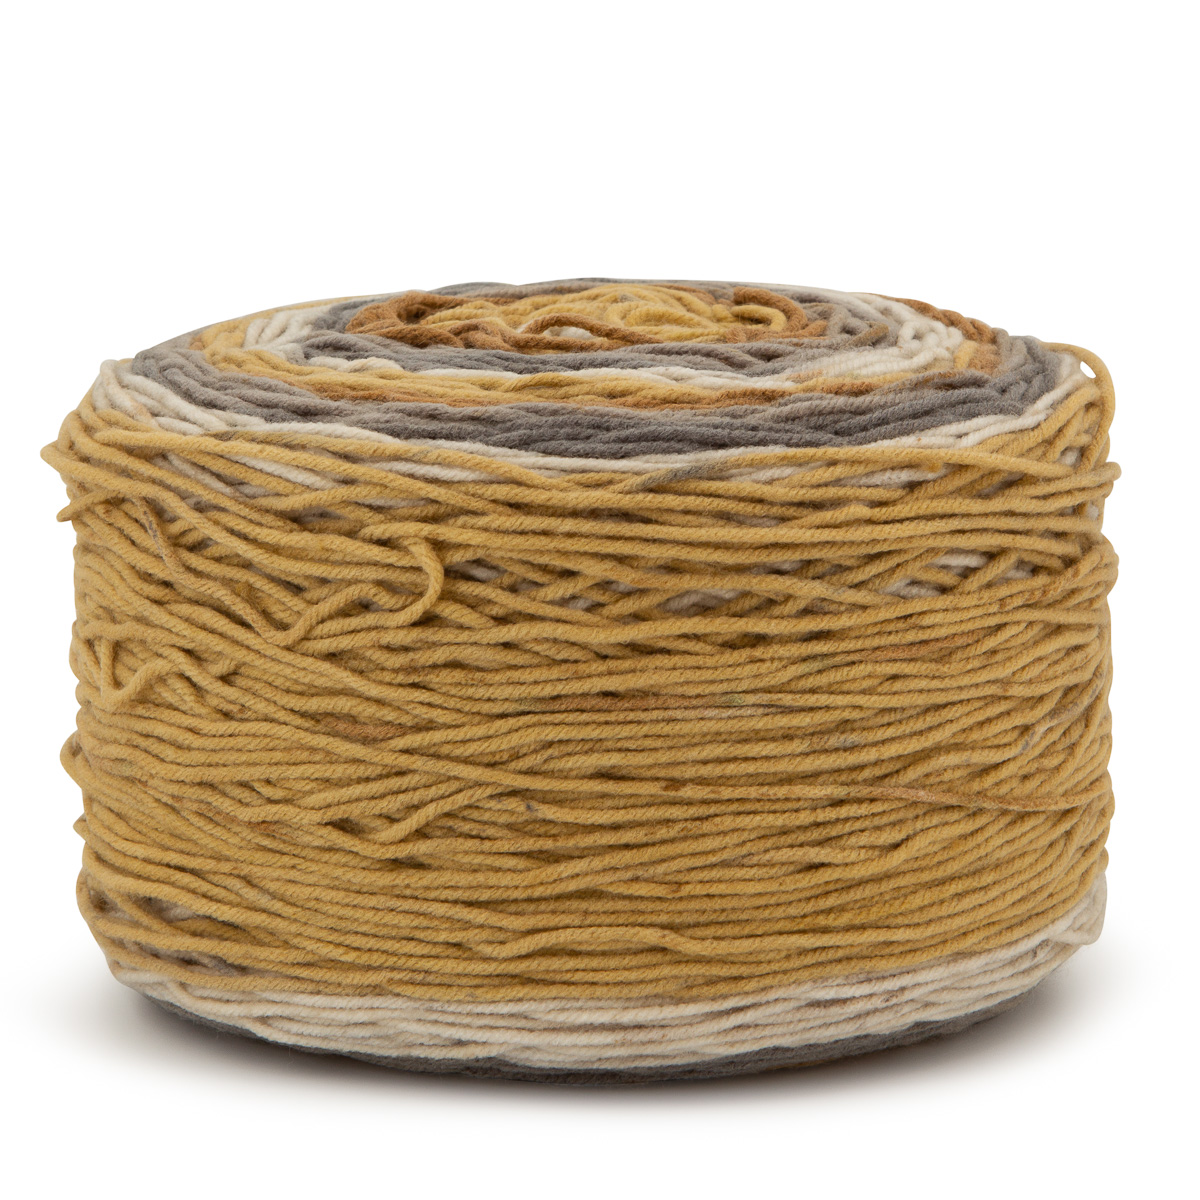 Caron-Big-Cakes-100-Acrylic-Worsted-Striping-Yarn-Medium-4-Cake-Knit-Crochet thumbnail 17